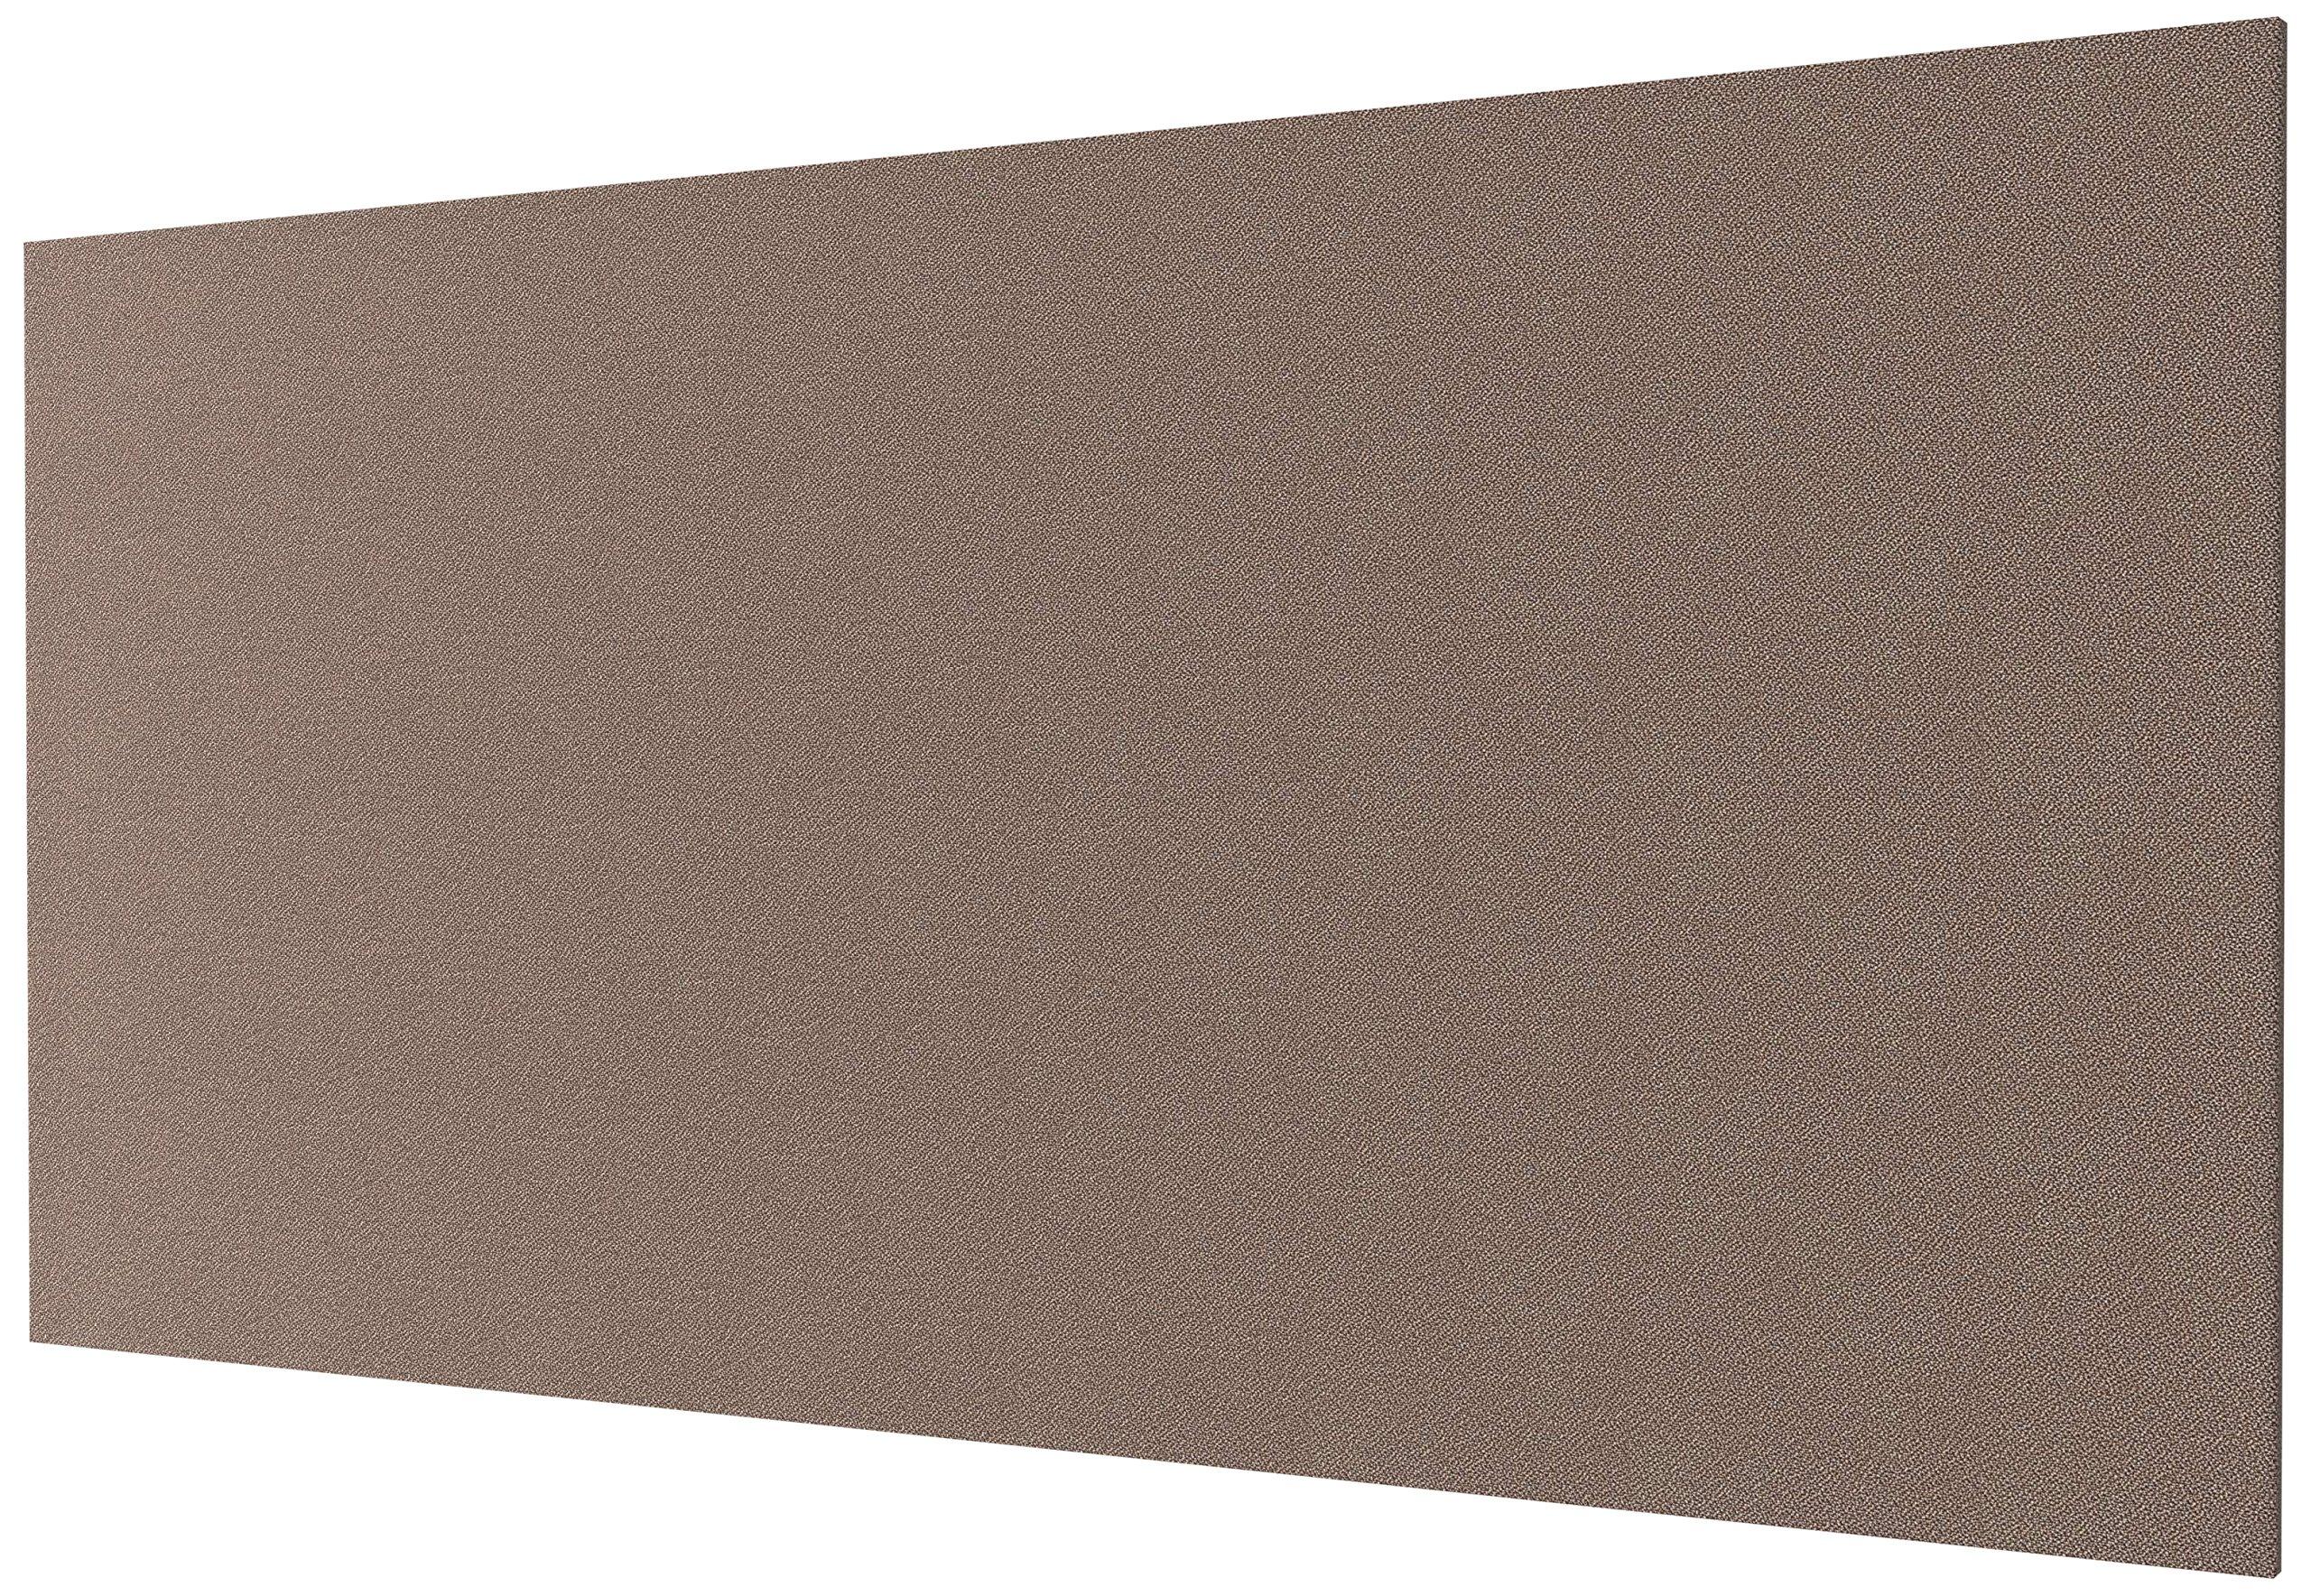 OBEX 30X60-TB-R-JA Rectangle Tackboard Contemporary Java